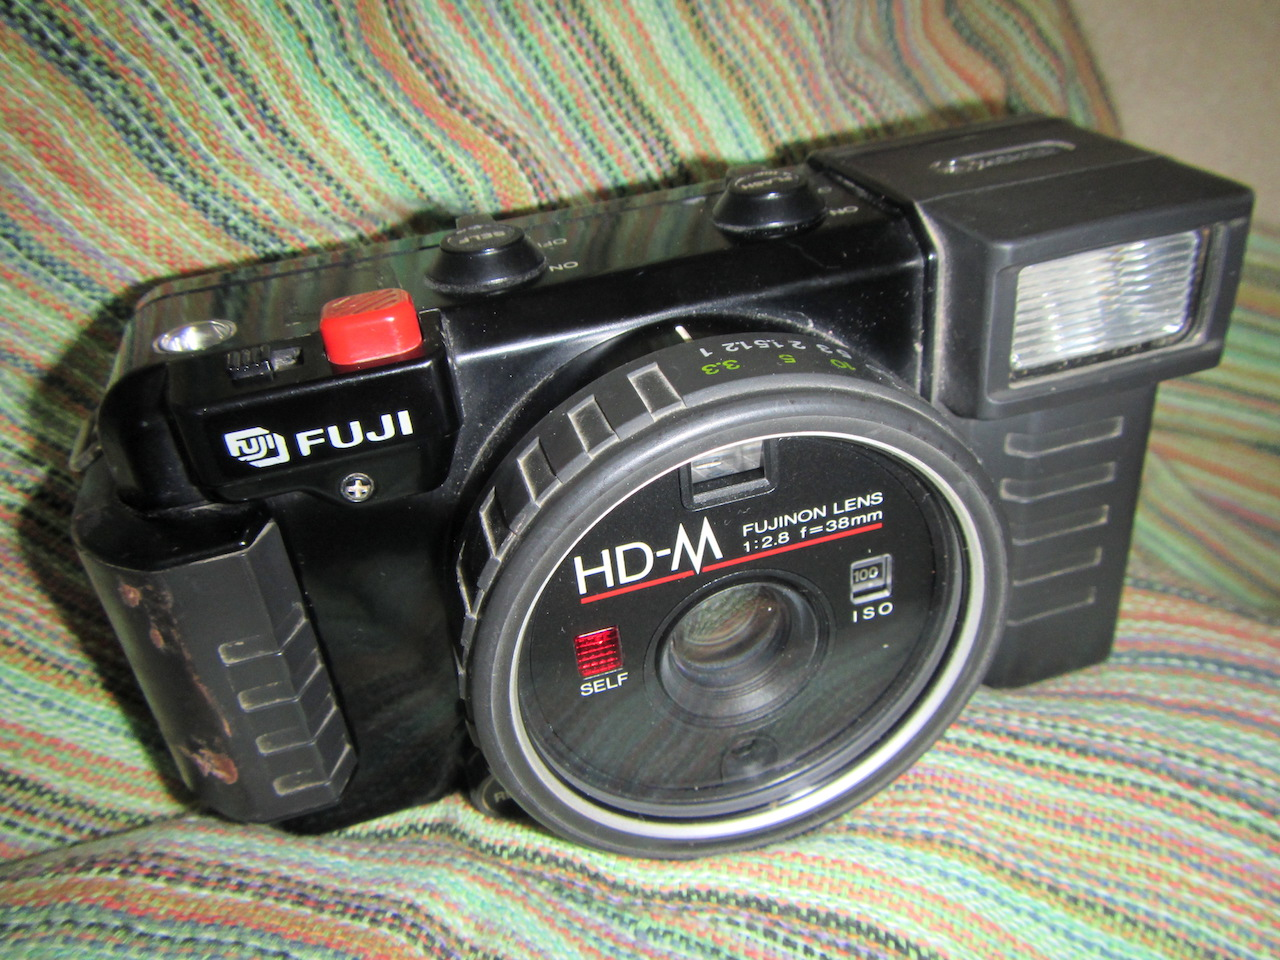 Fuji HD-M